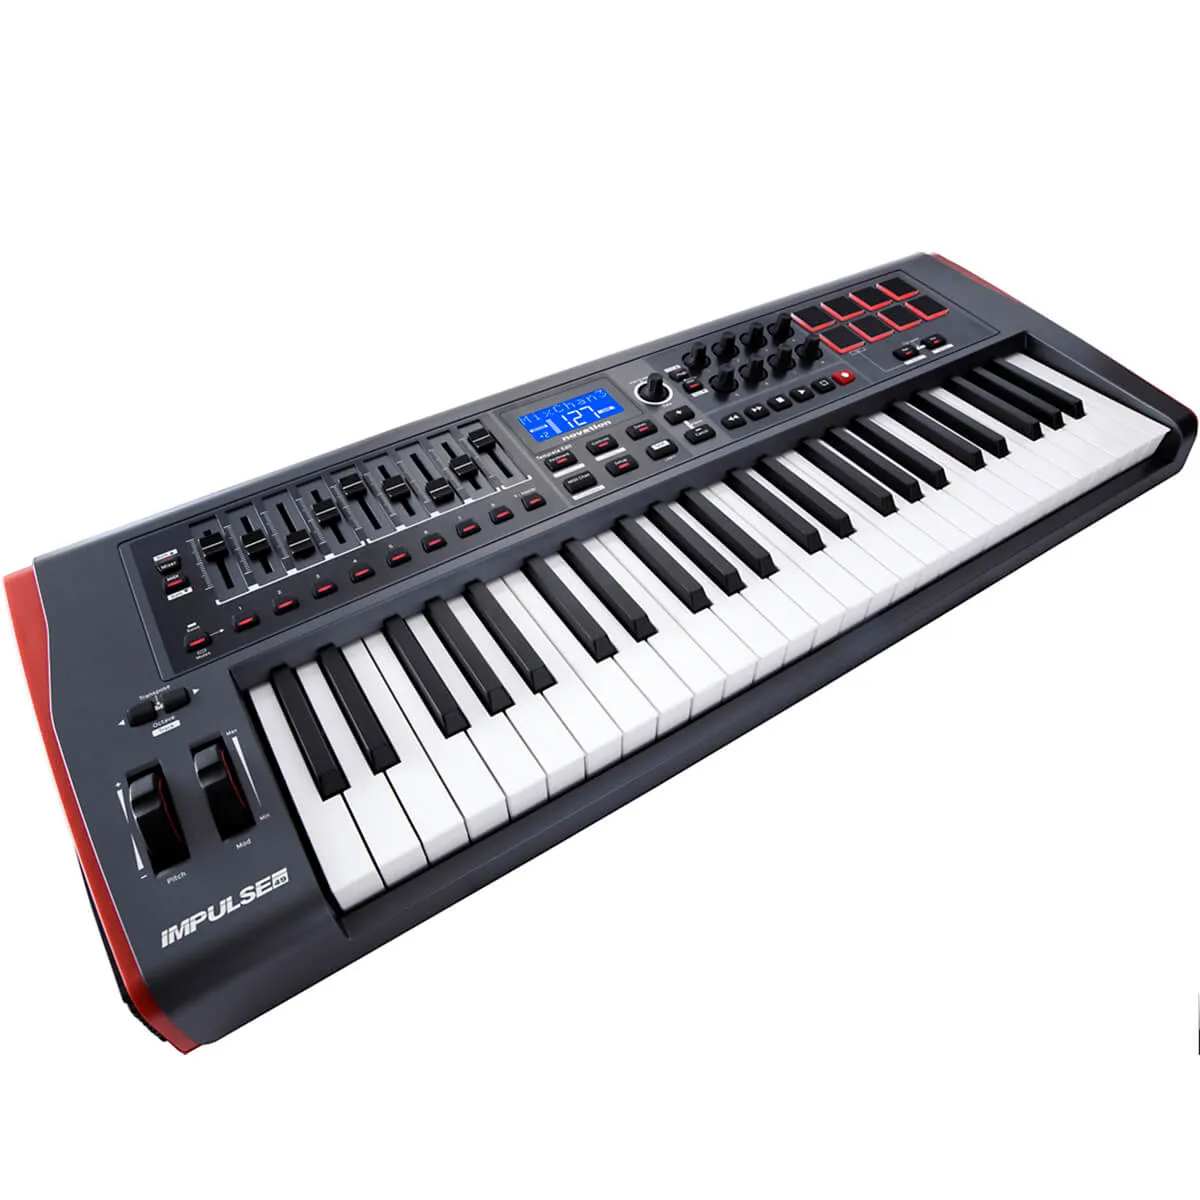 Teclado Controlador Novation Impulse 49 USB/MIDI